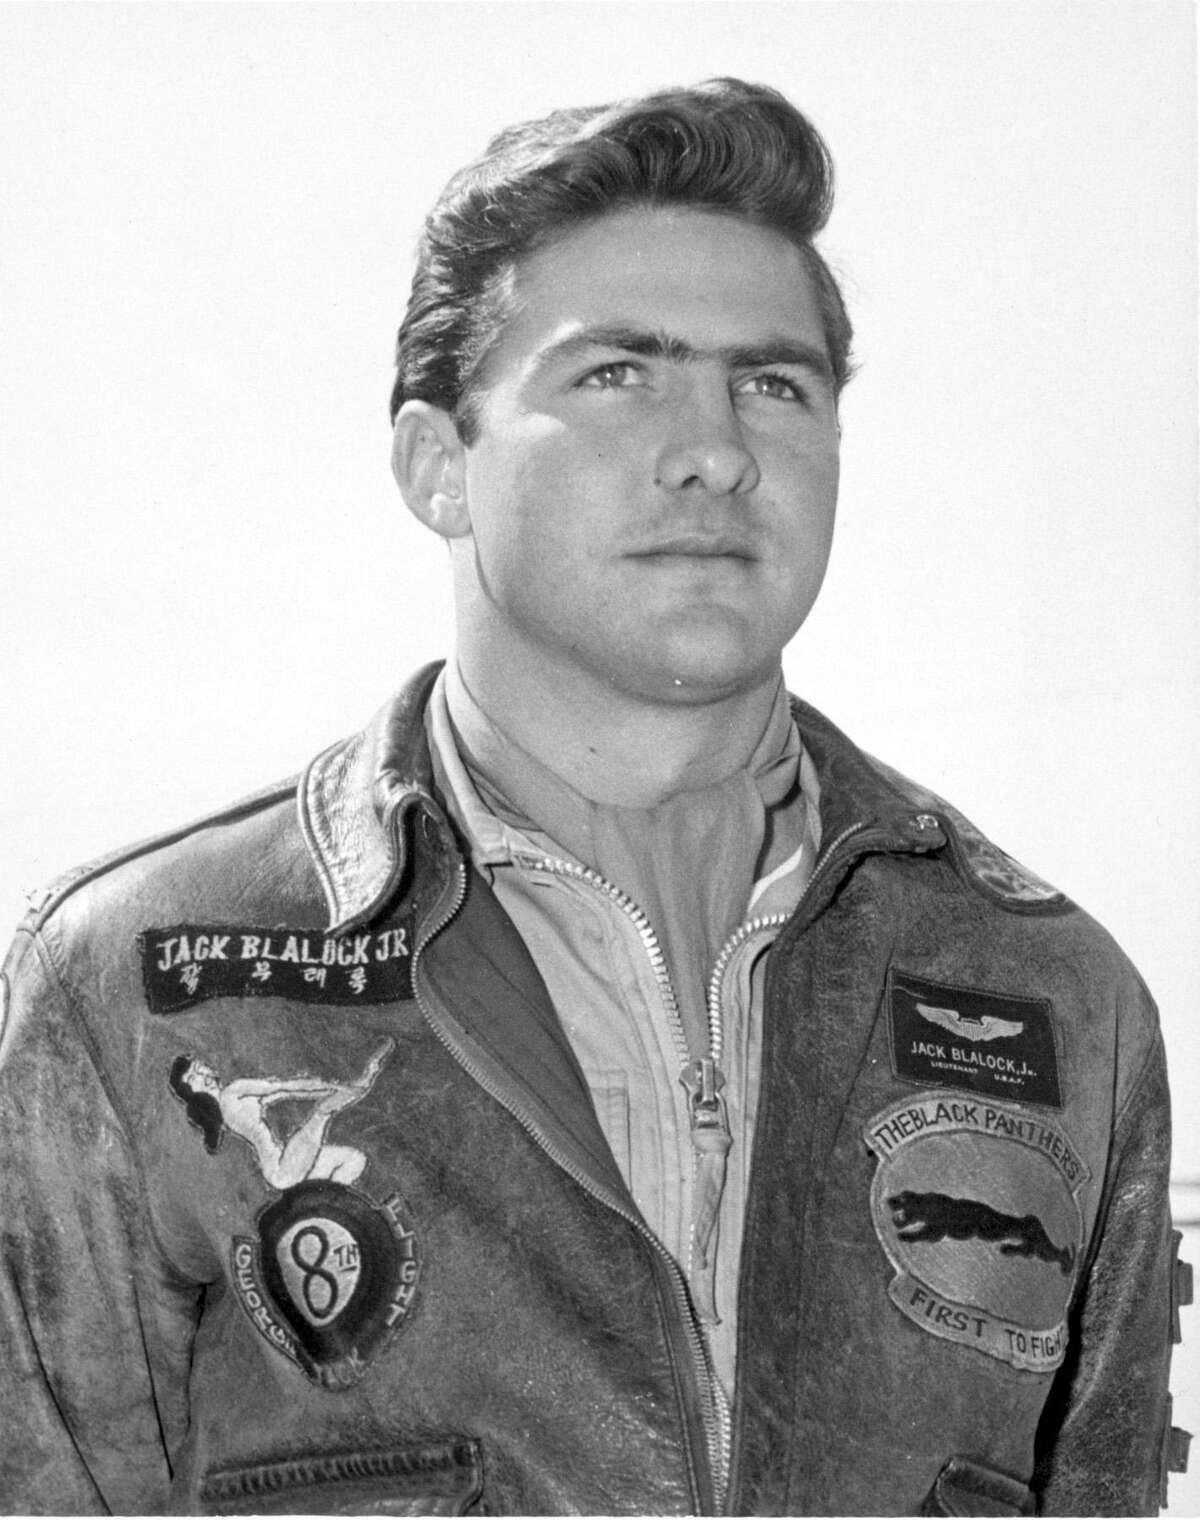 Jack Boothe Blalock Jr., Ace in the air, Korean War vet and partner in Backstreet Cafe.